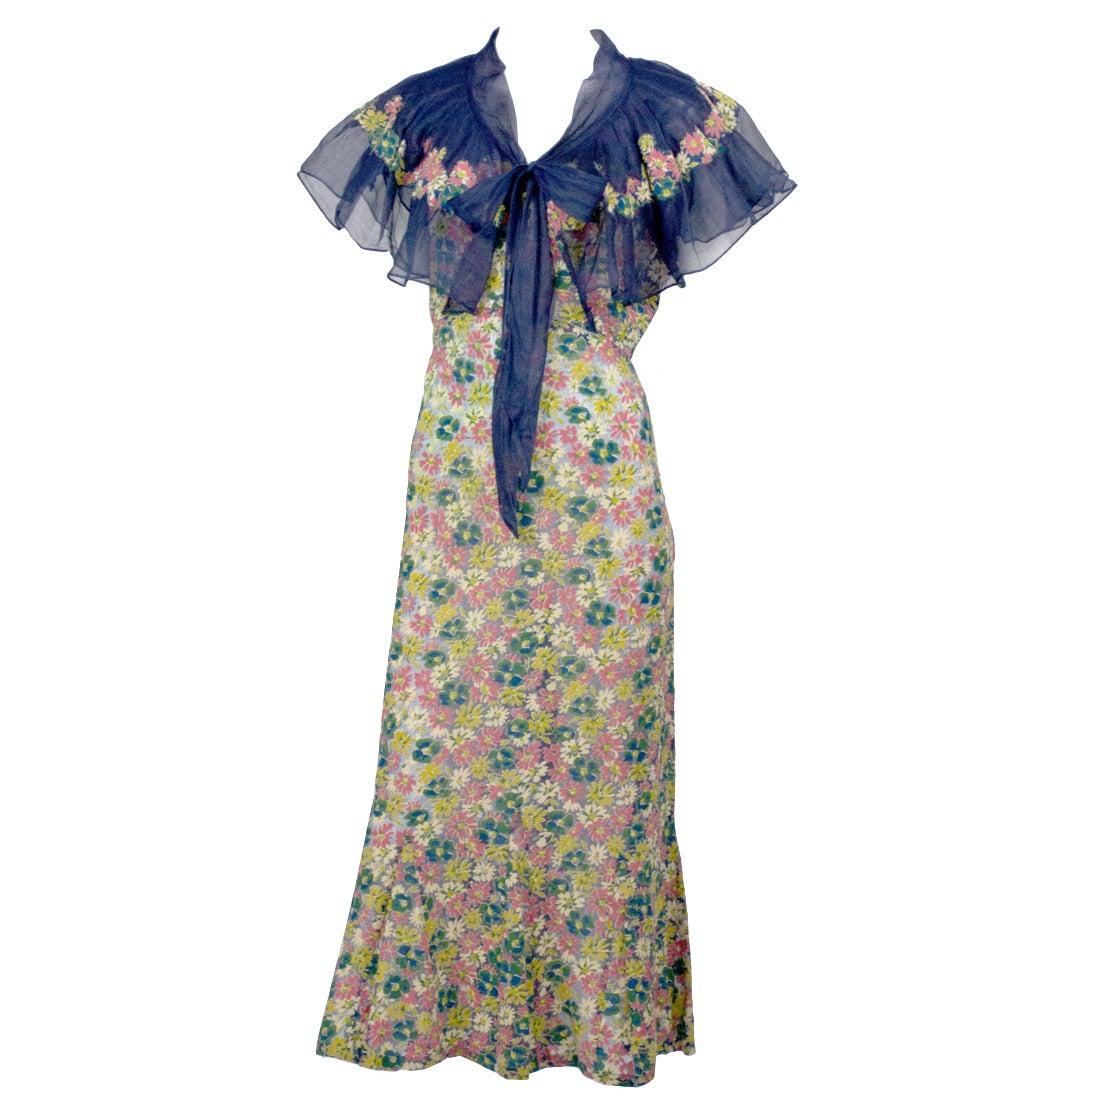 Rare 1930s Vintage Chanel Adaptation Dress Floral Velvet Applique Silk Organza 1